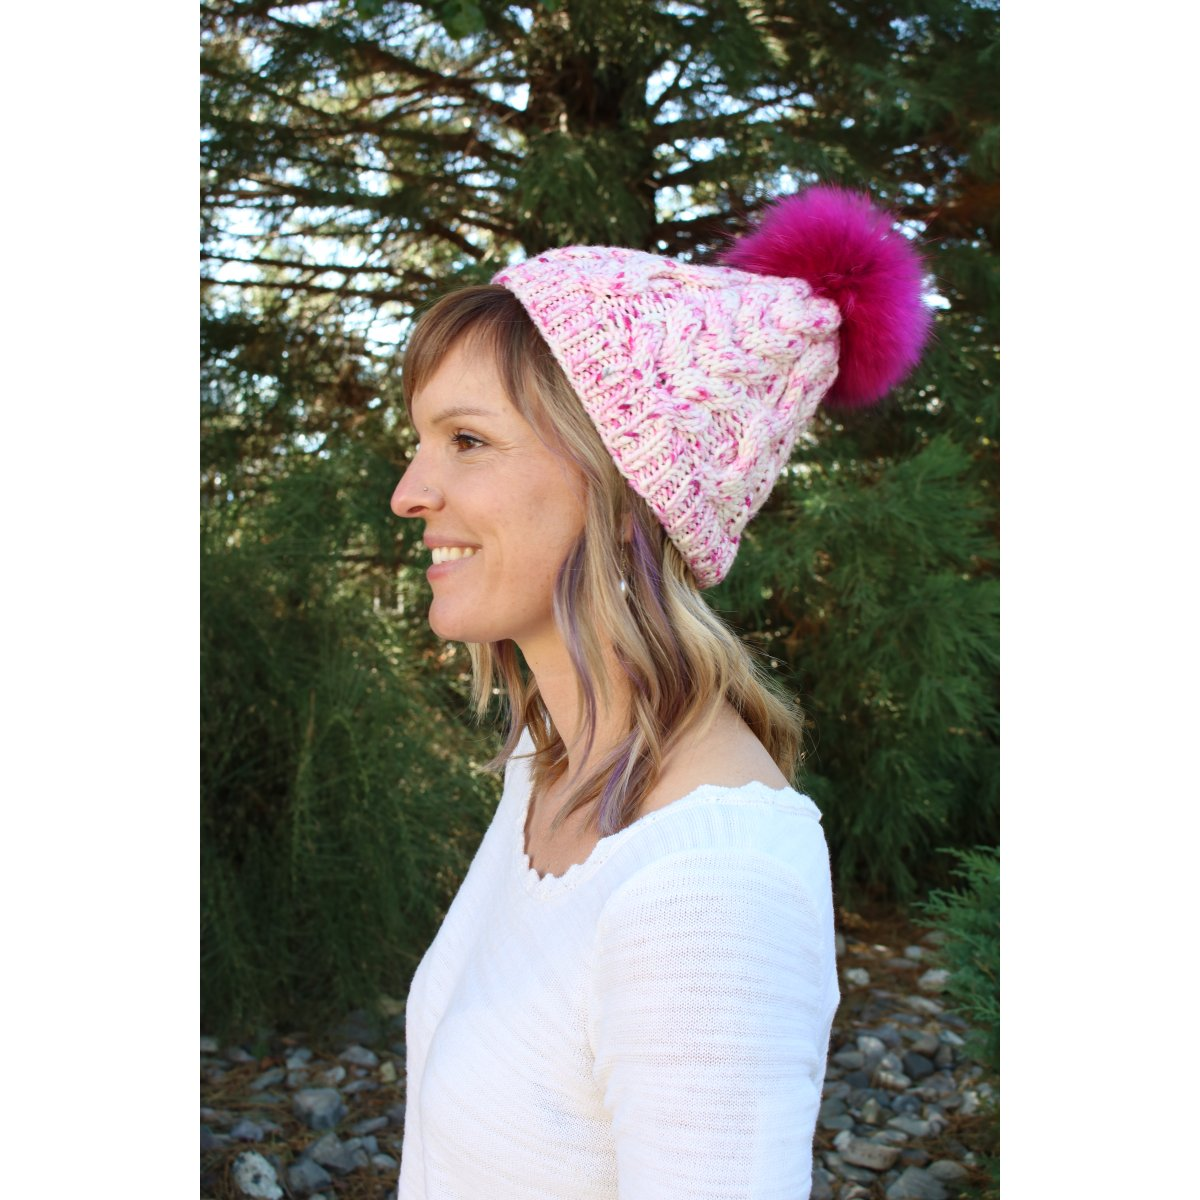 f912e0edac0 Jimmy Beans Wool Breast Cancer Awareness - Pom Pom Hat Kit (Ta Tas ...